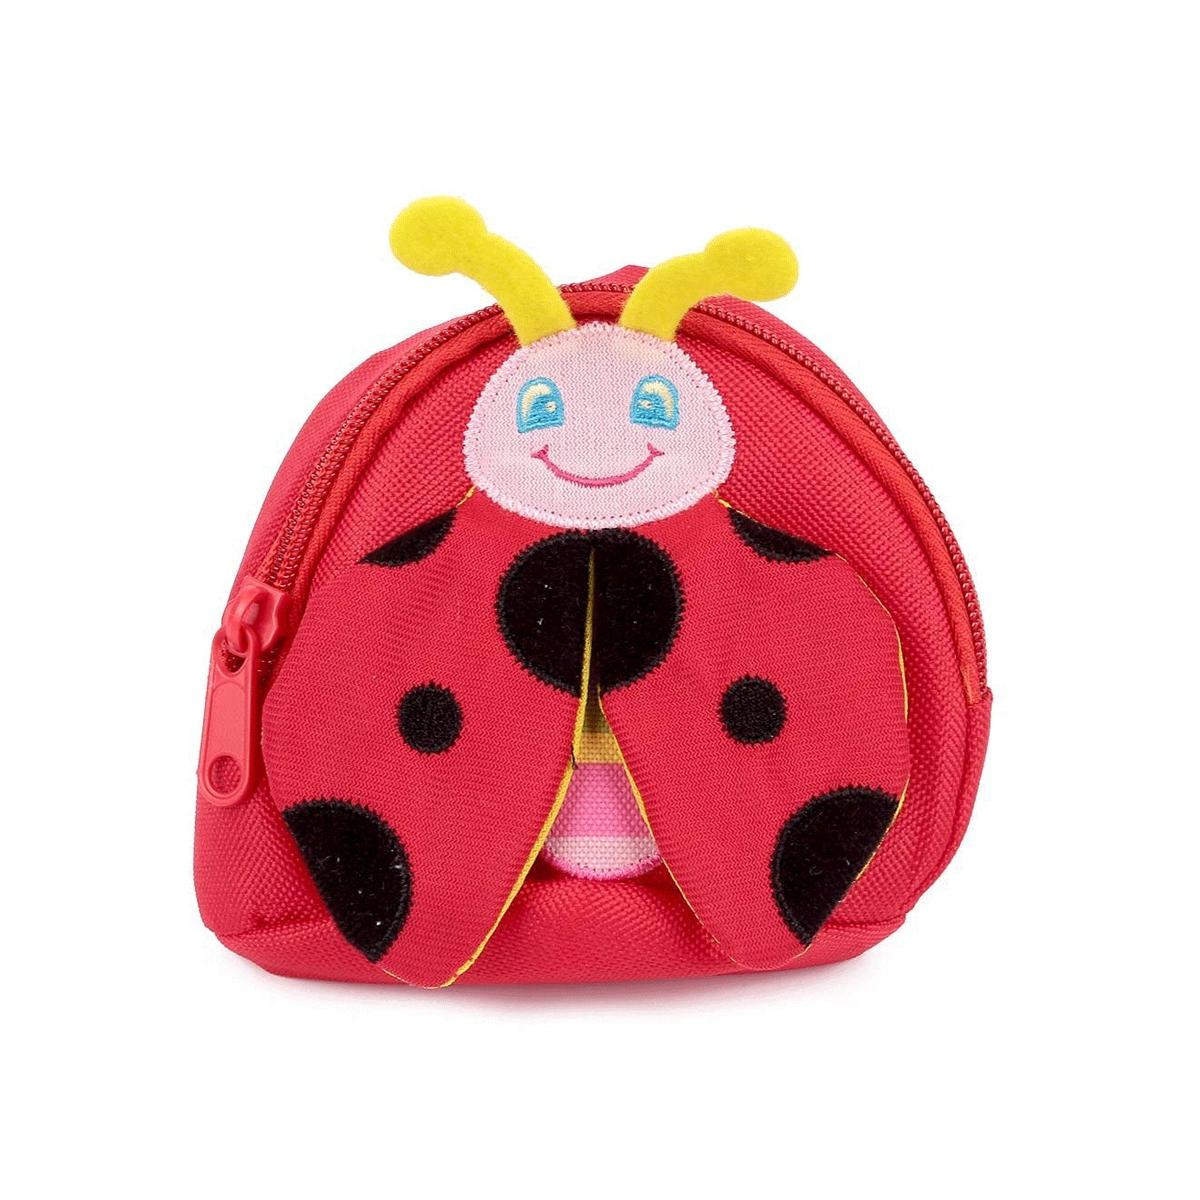 Рюкзак-сумка Leader Kids Божья коровка 11 см.